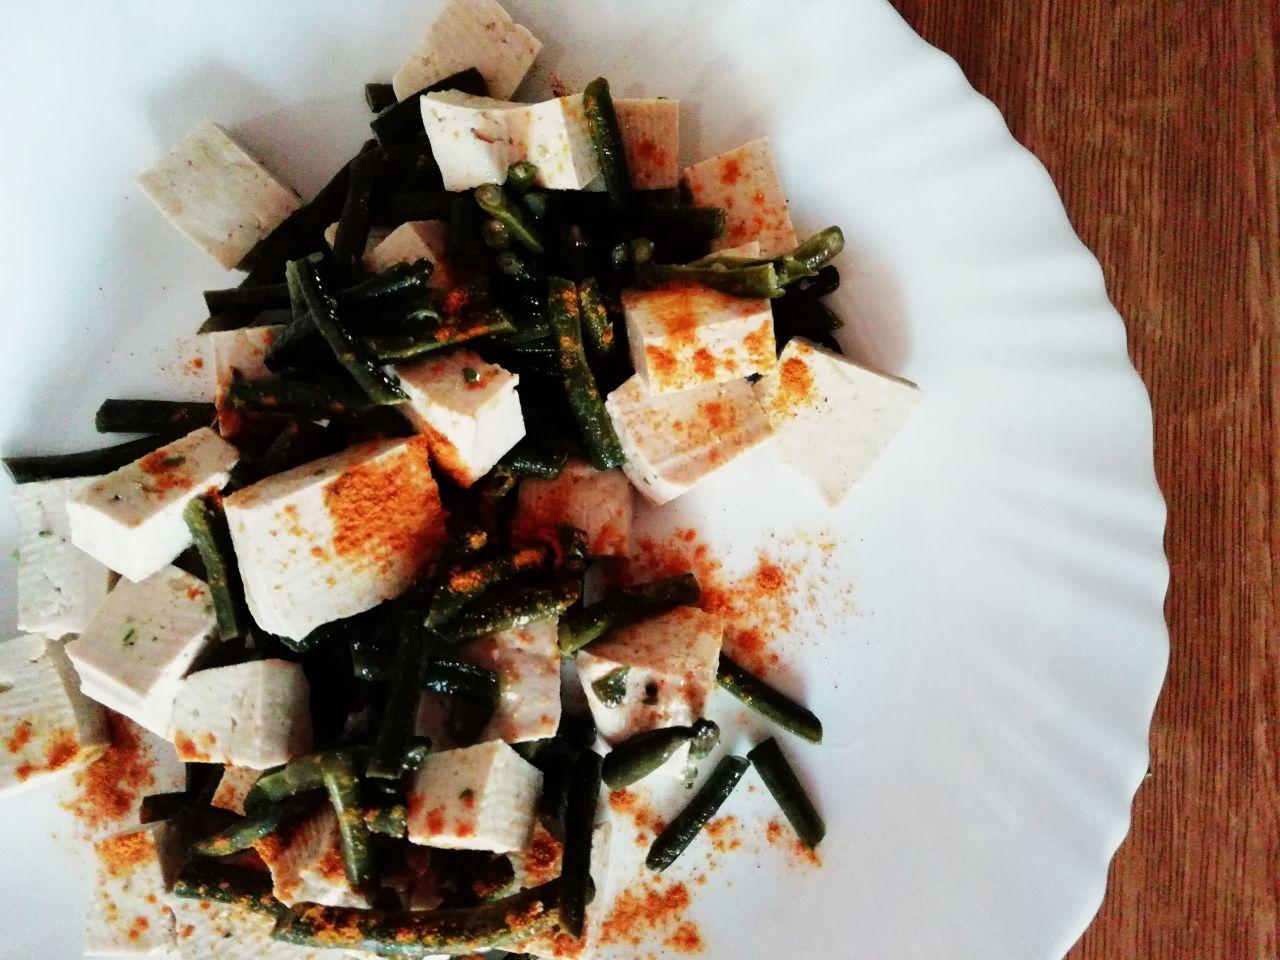 Insalate estive: di tofu con fagiolini e alla curcuma!